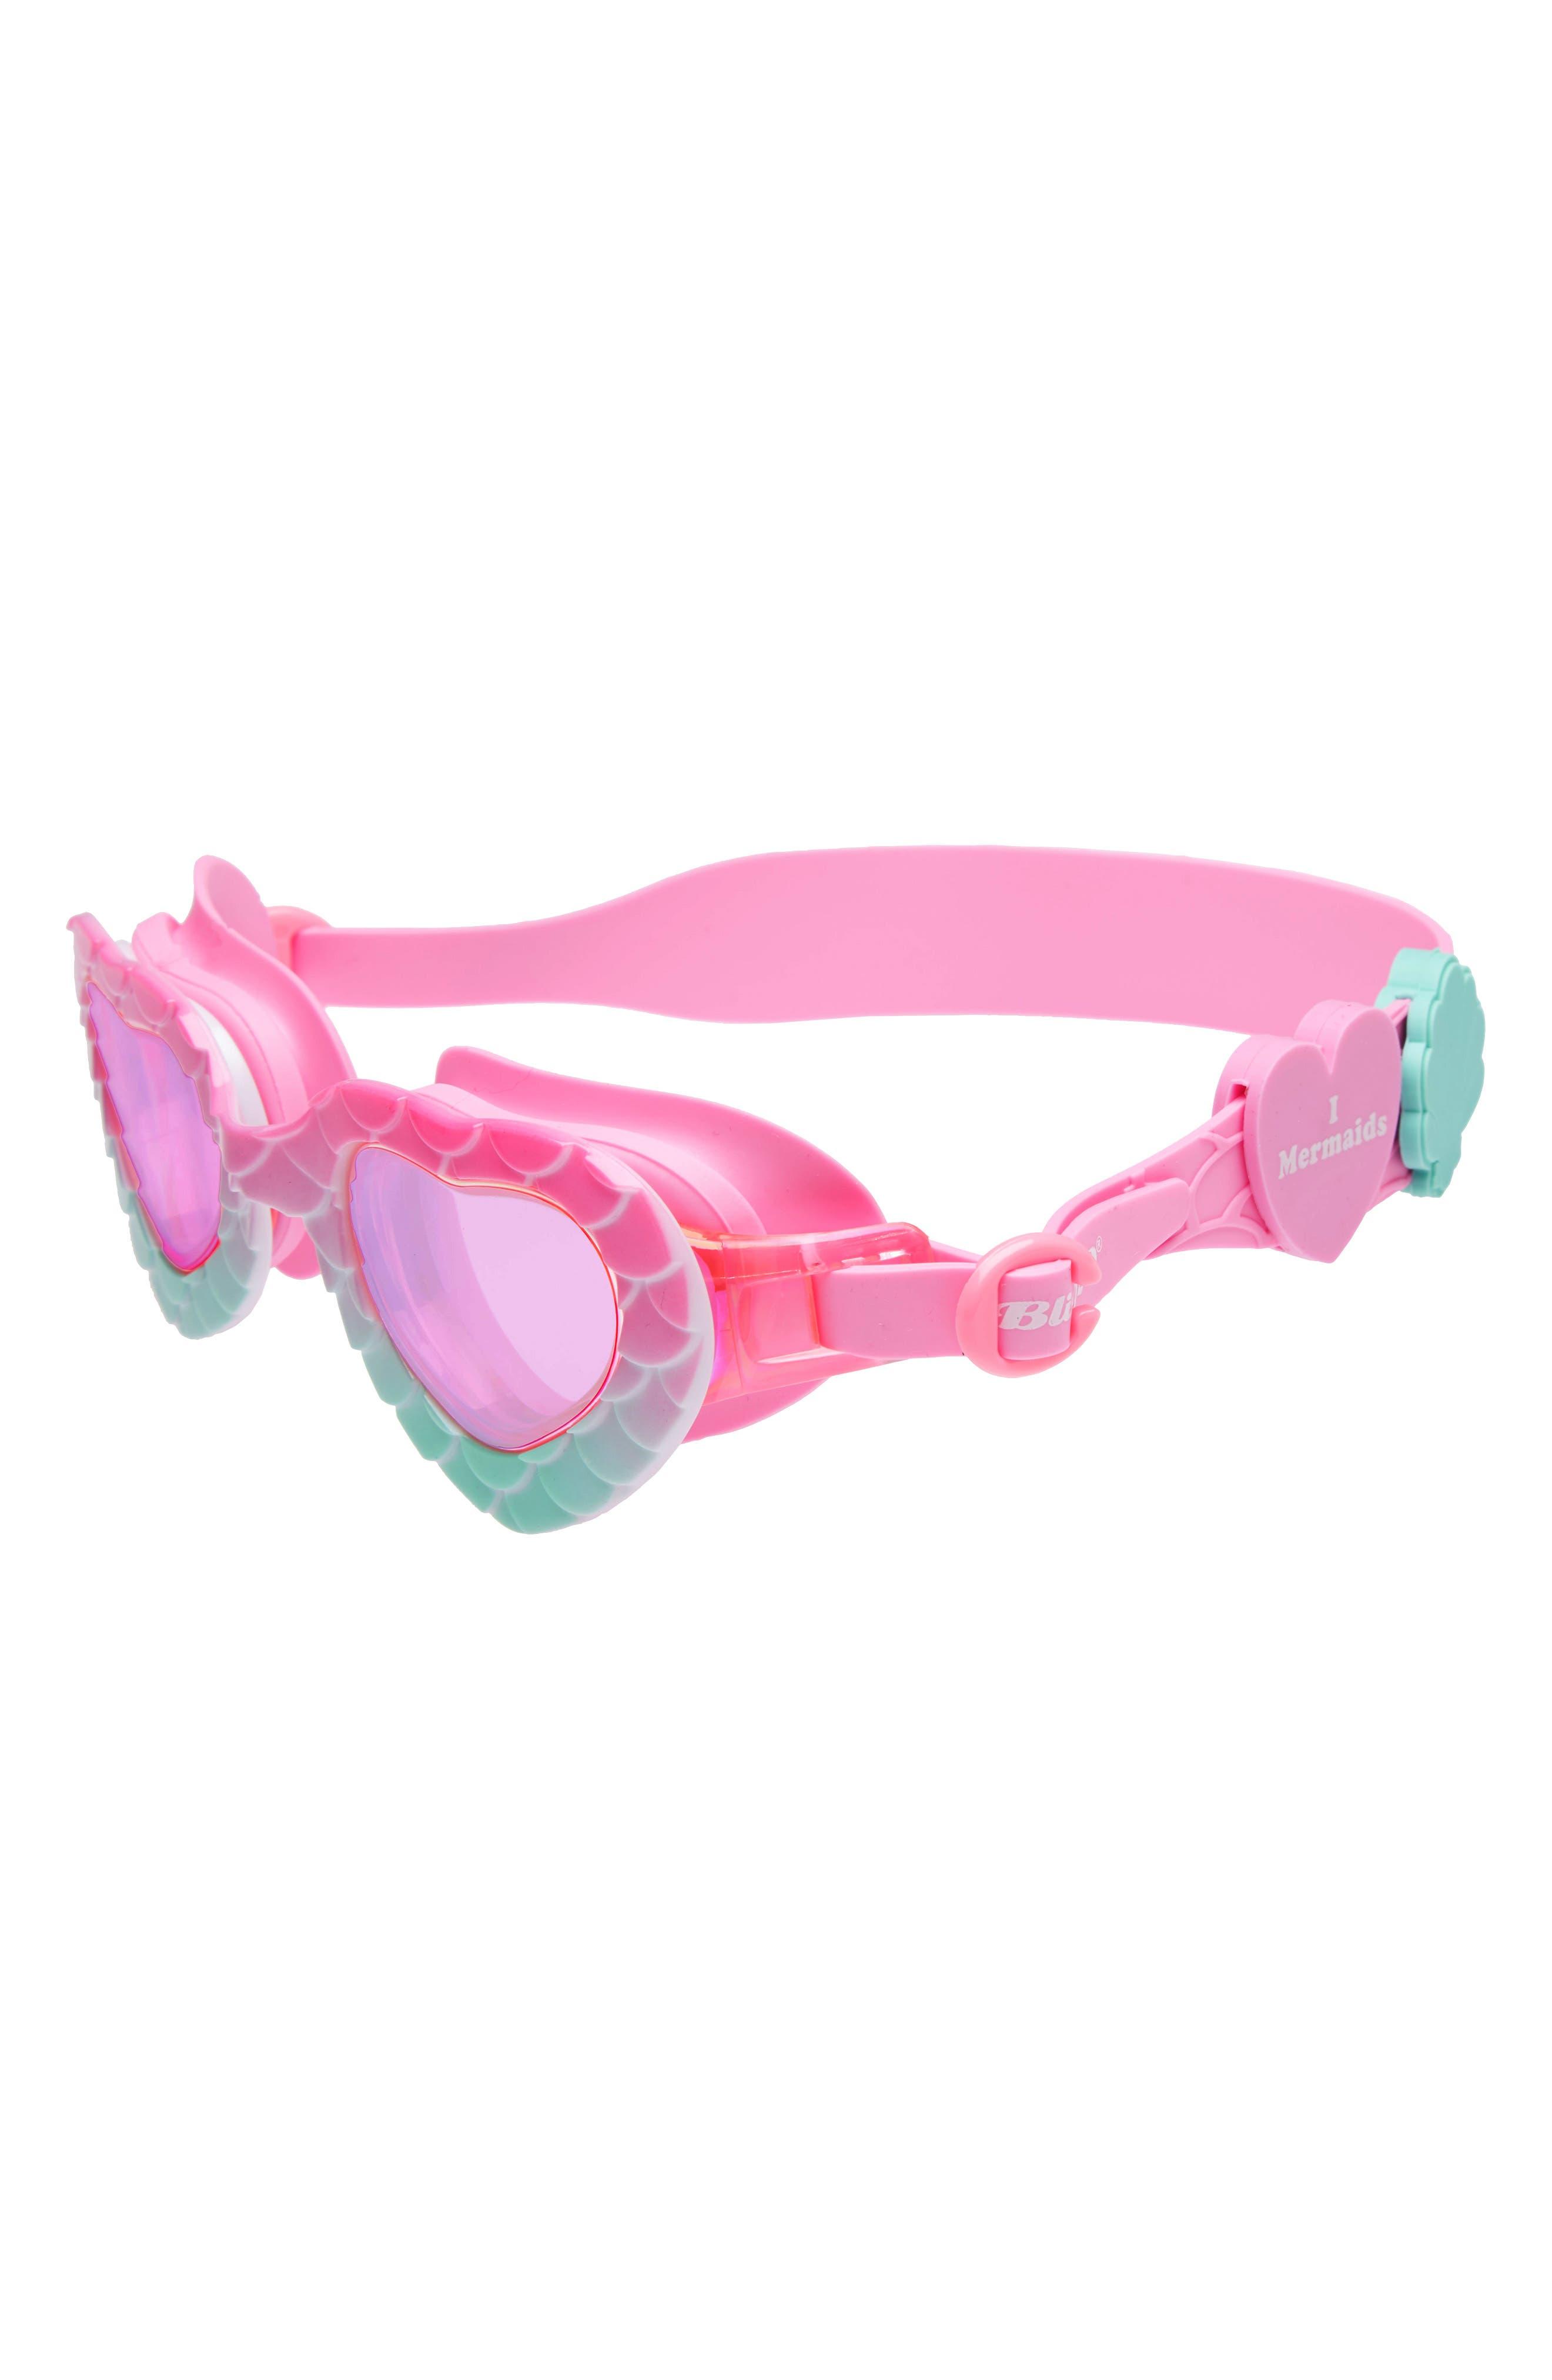 I Love Mermaids Swim Goggles,                         Main,                         color, Green